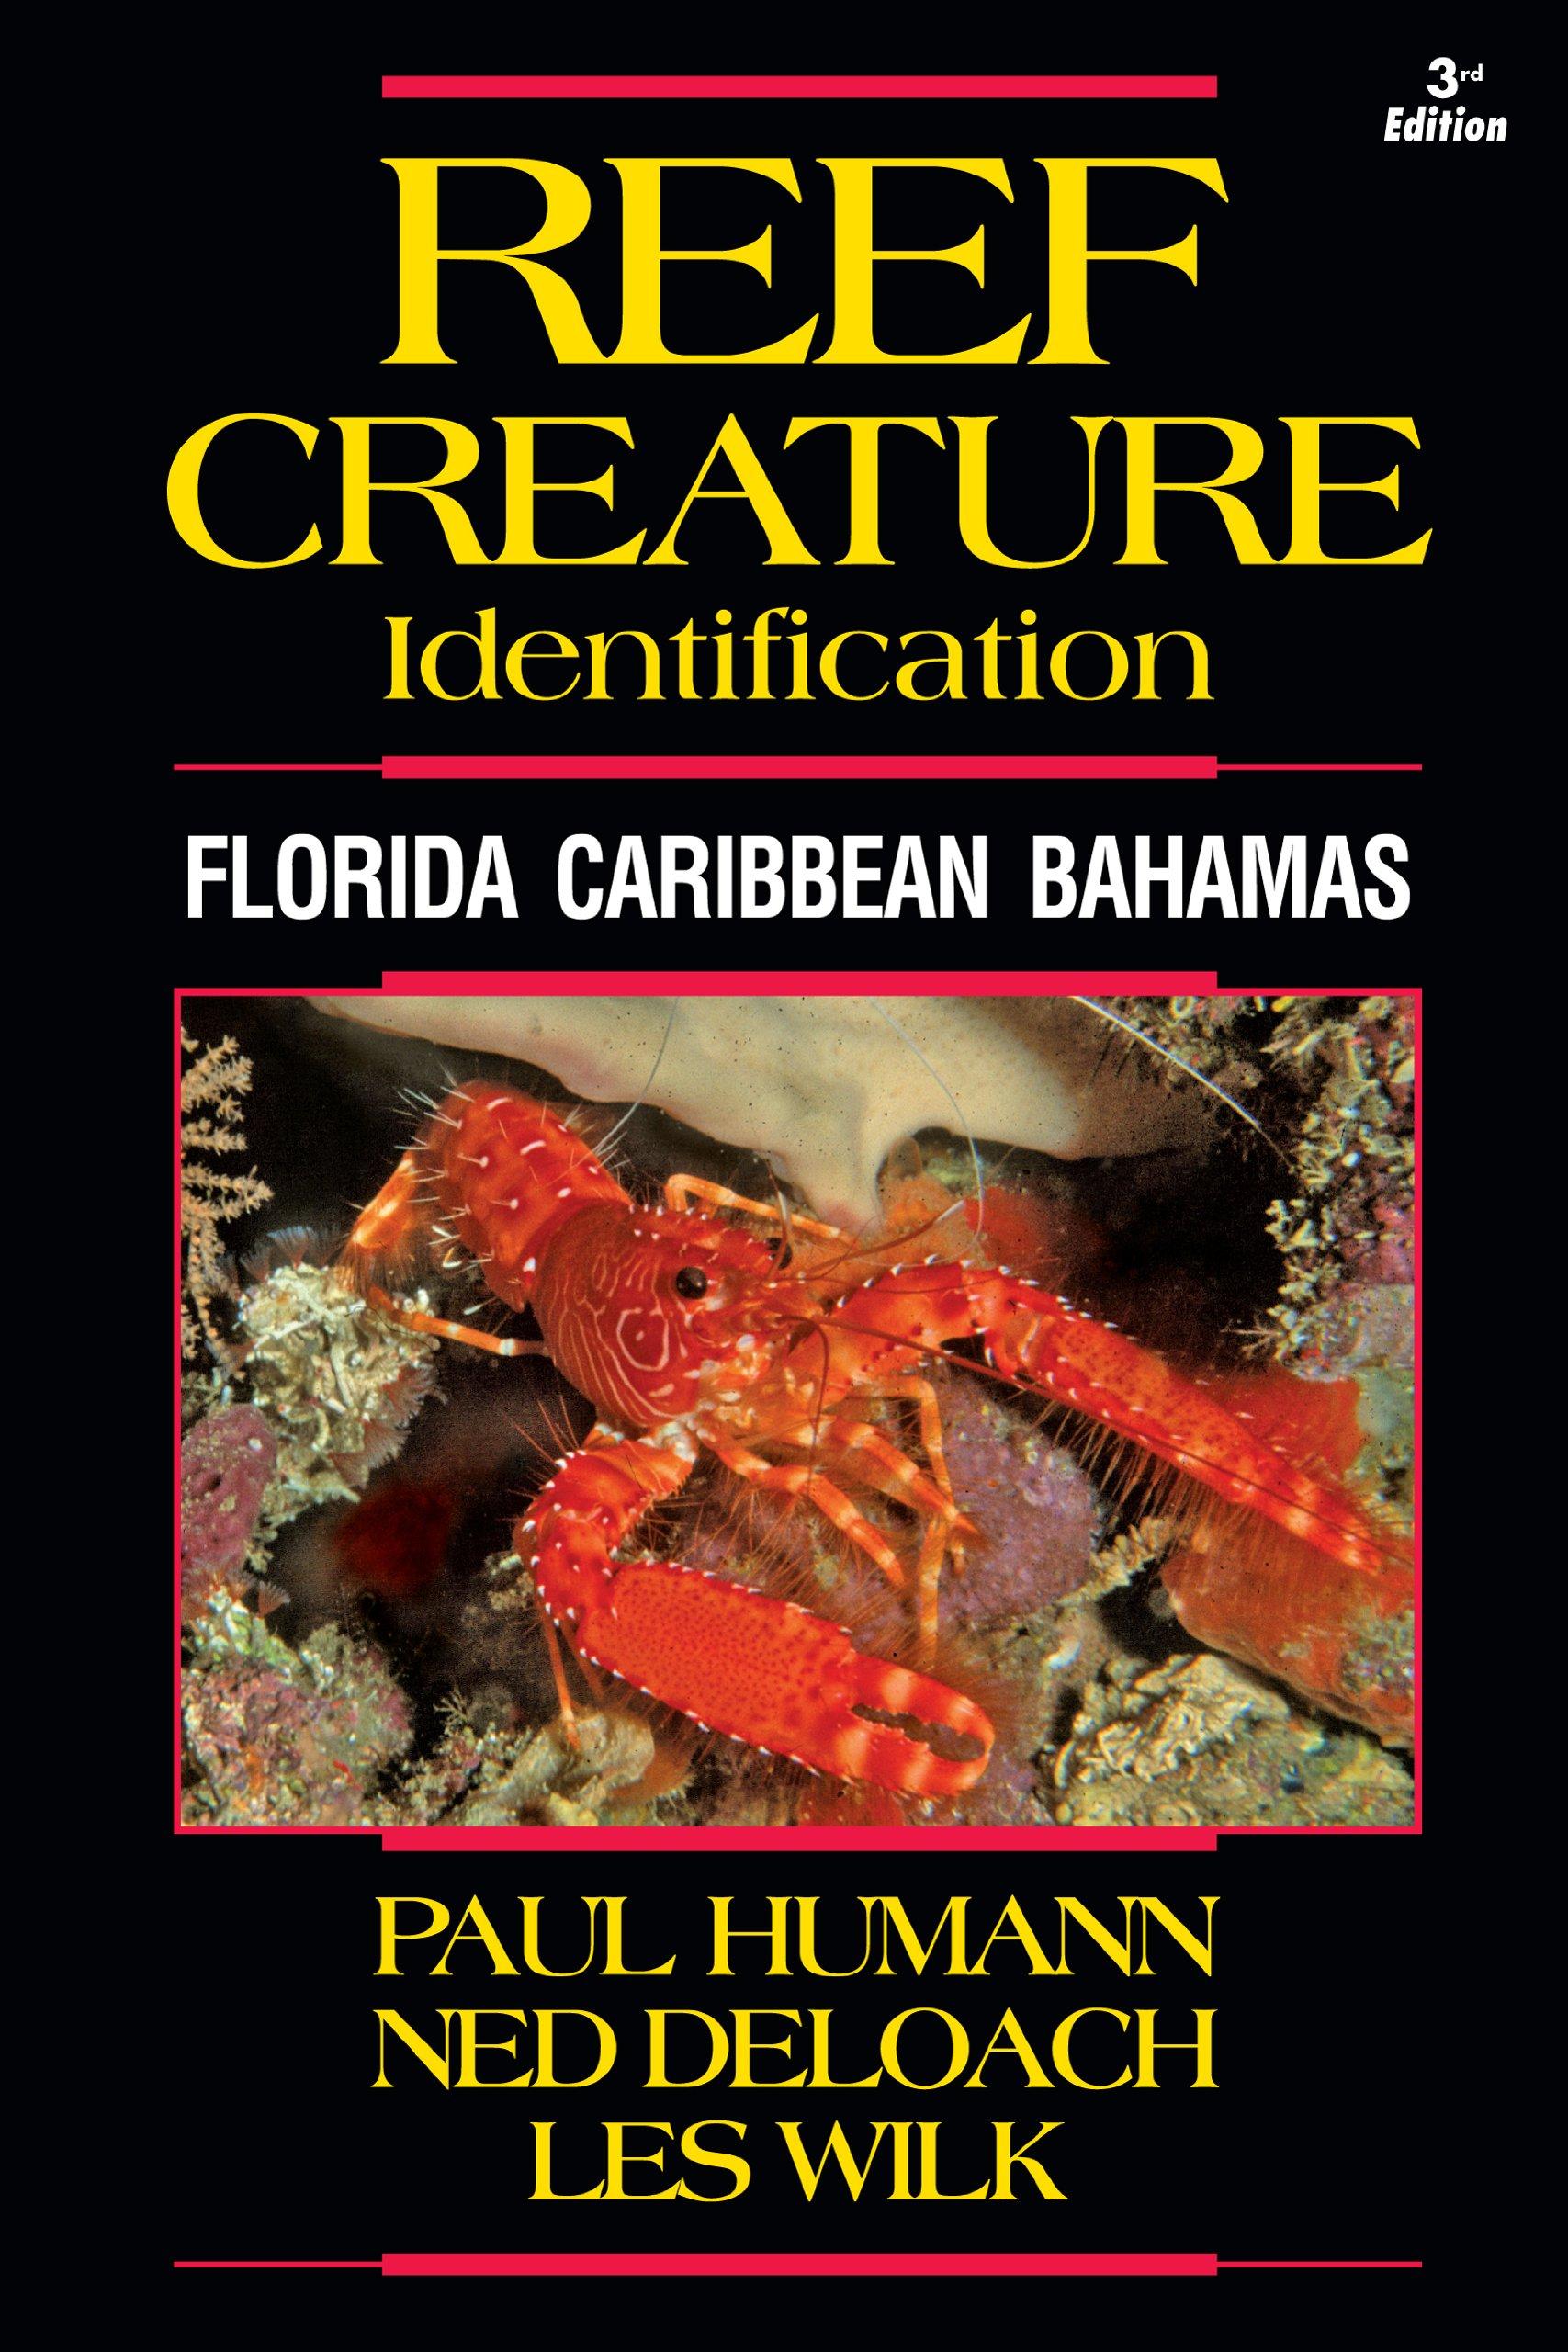 reef creature identification florida caribbean bahamas 3rd edition